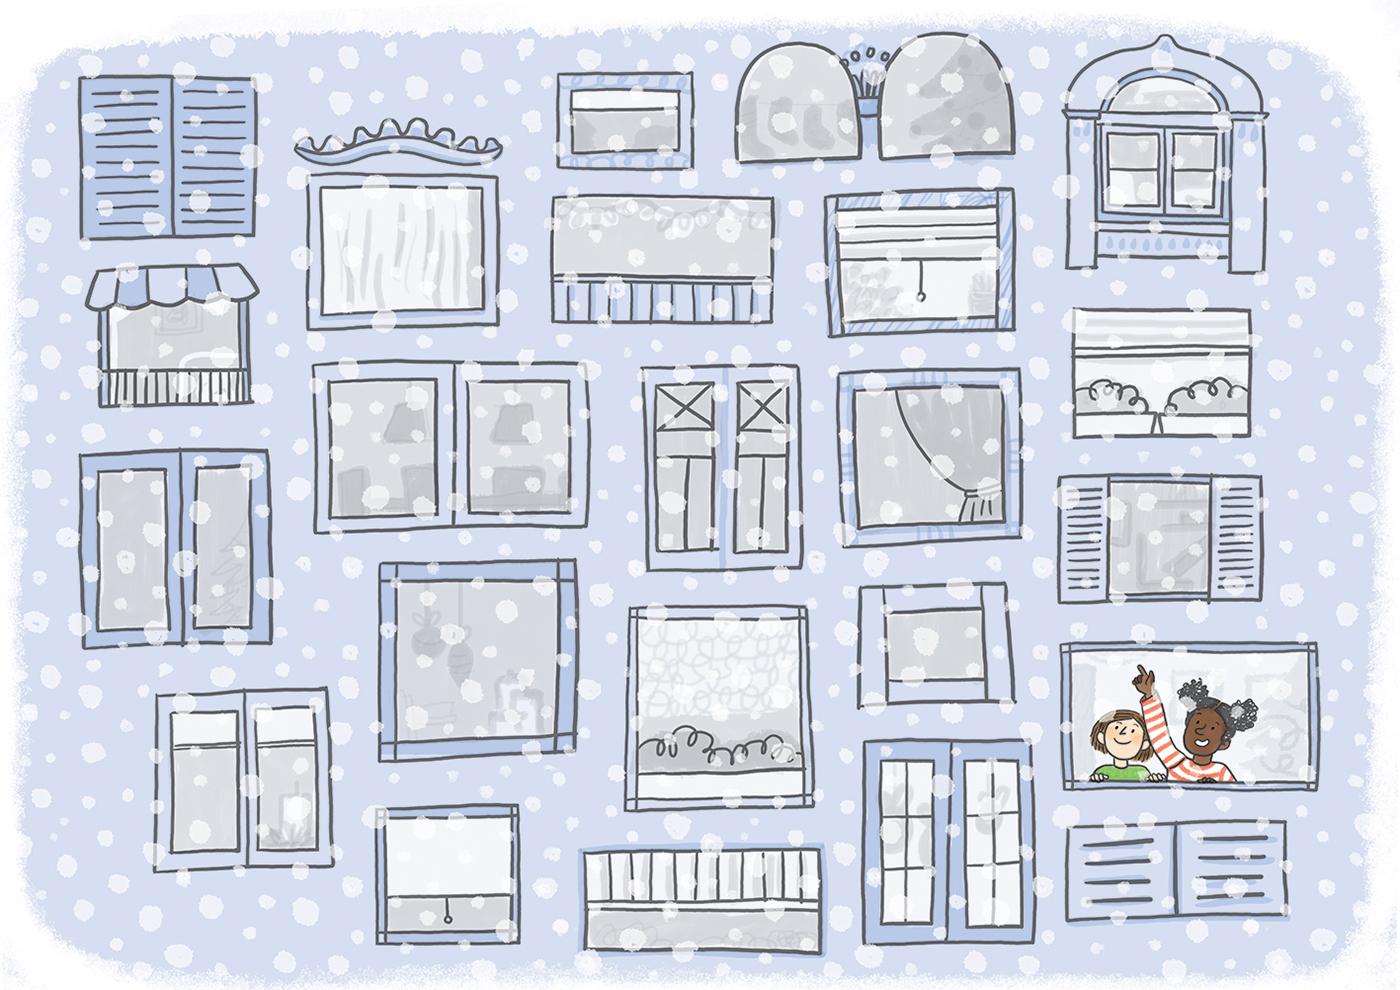 Cosebelle Mag/calendario di Dicembre